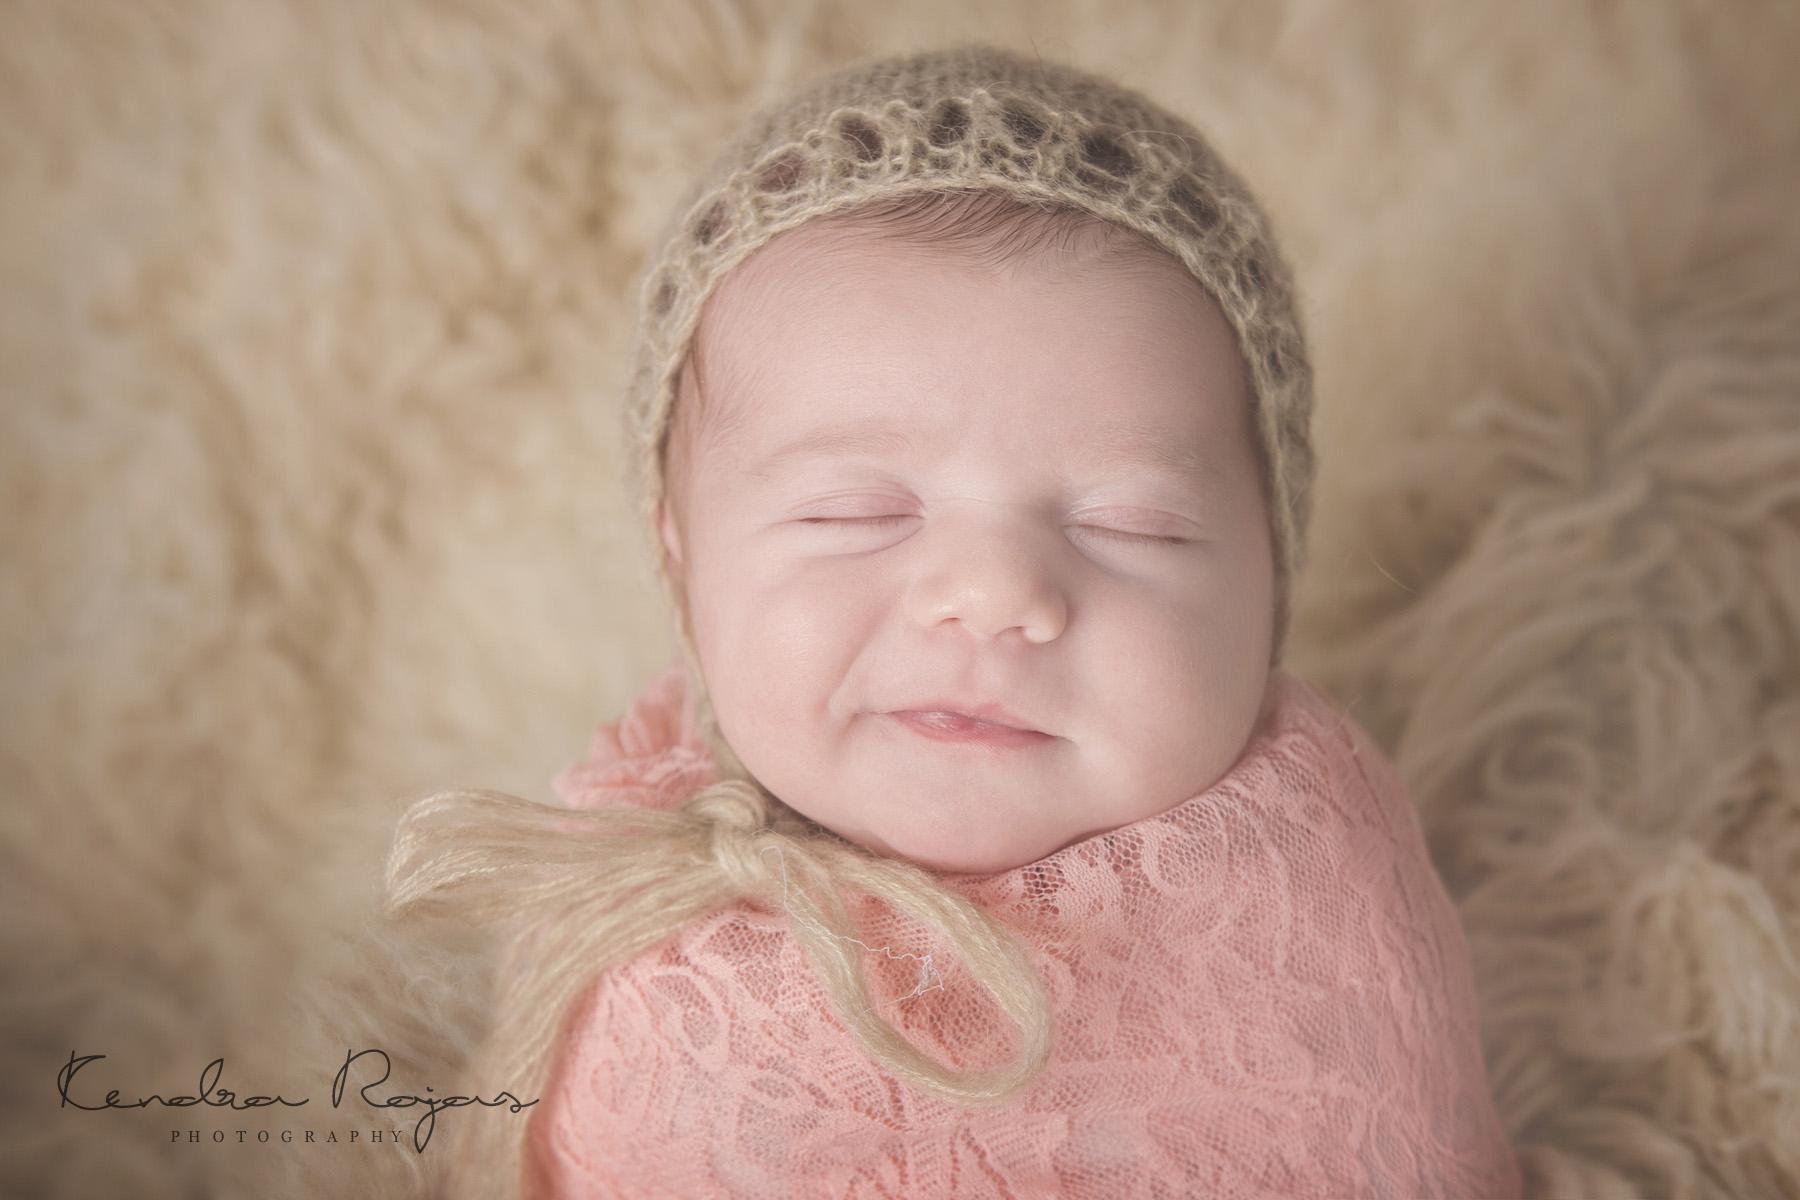 Newborn_Charlotte 112216_09_LOW_Social.jpg